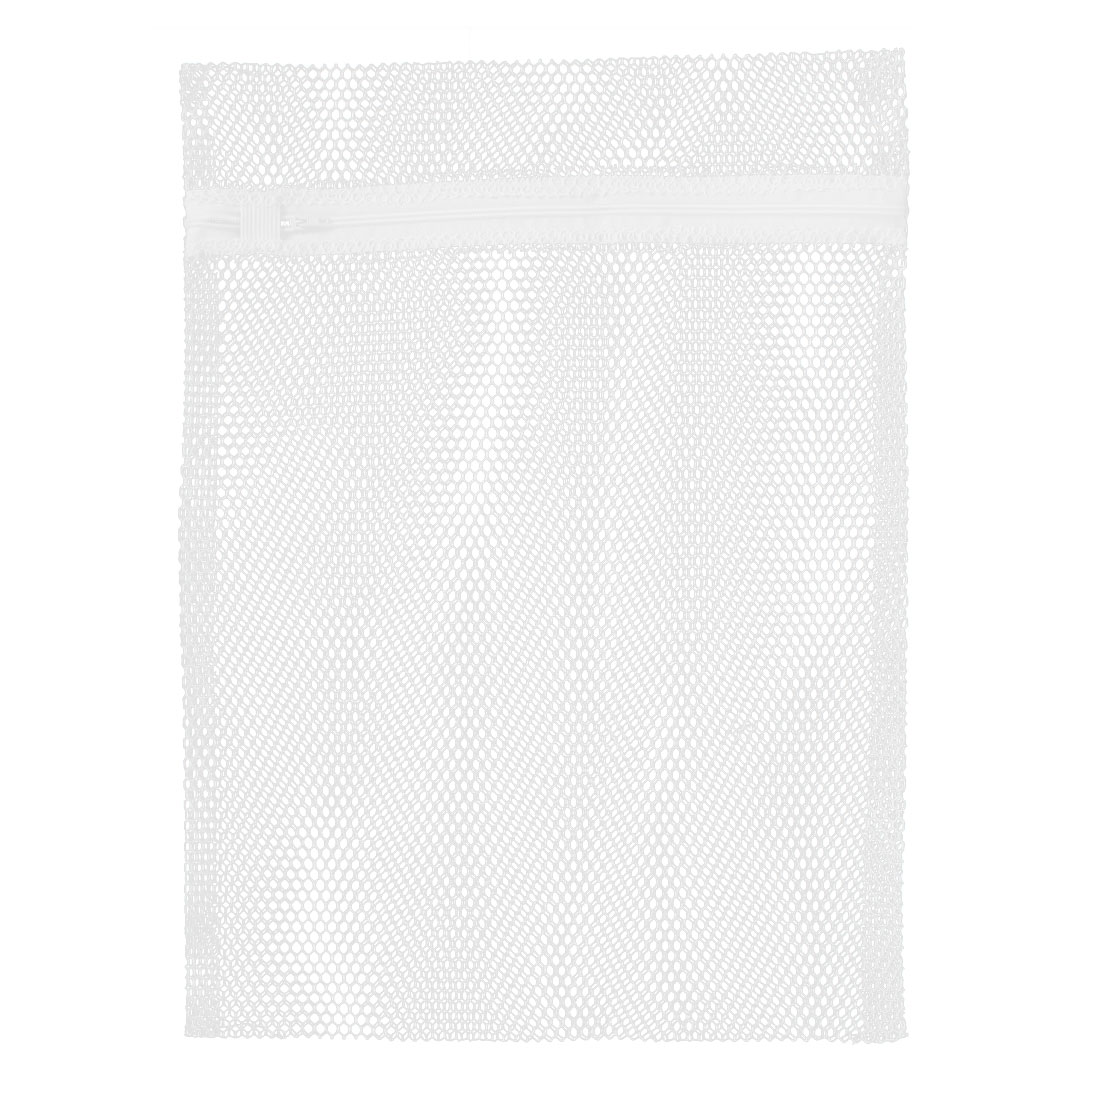 Zippered Socks Bra Clothes Laundry Washing Bags Net Mesh Holder White 40 x 30cm